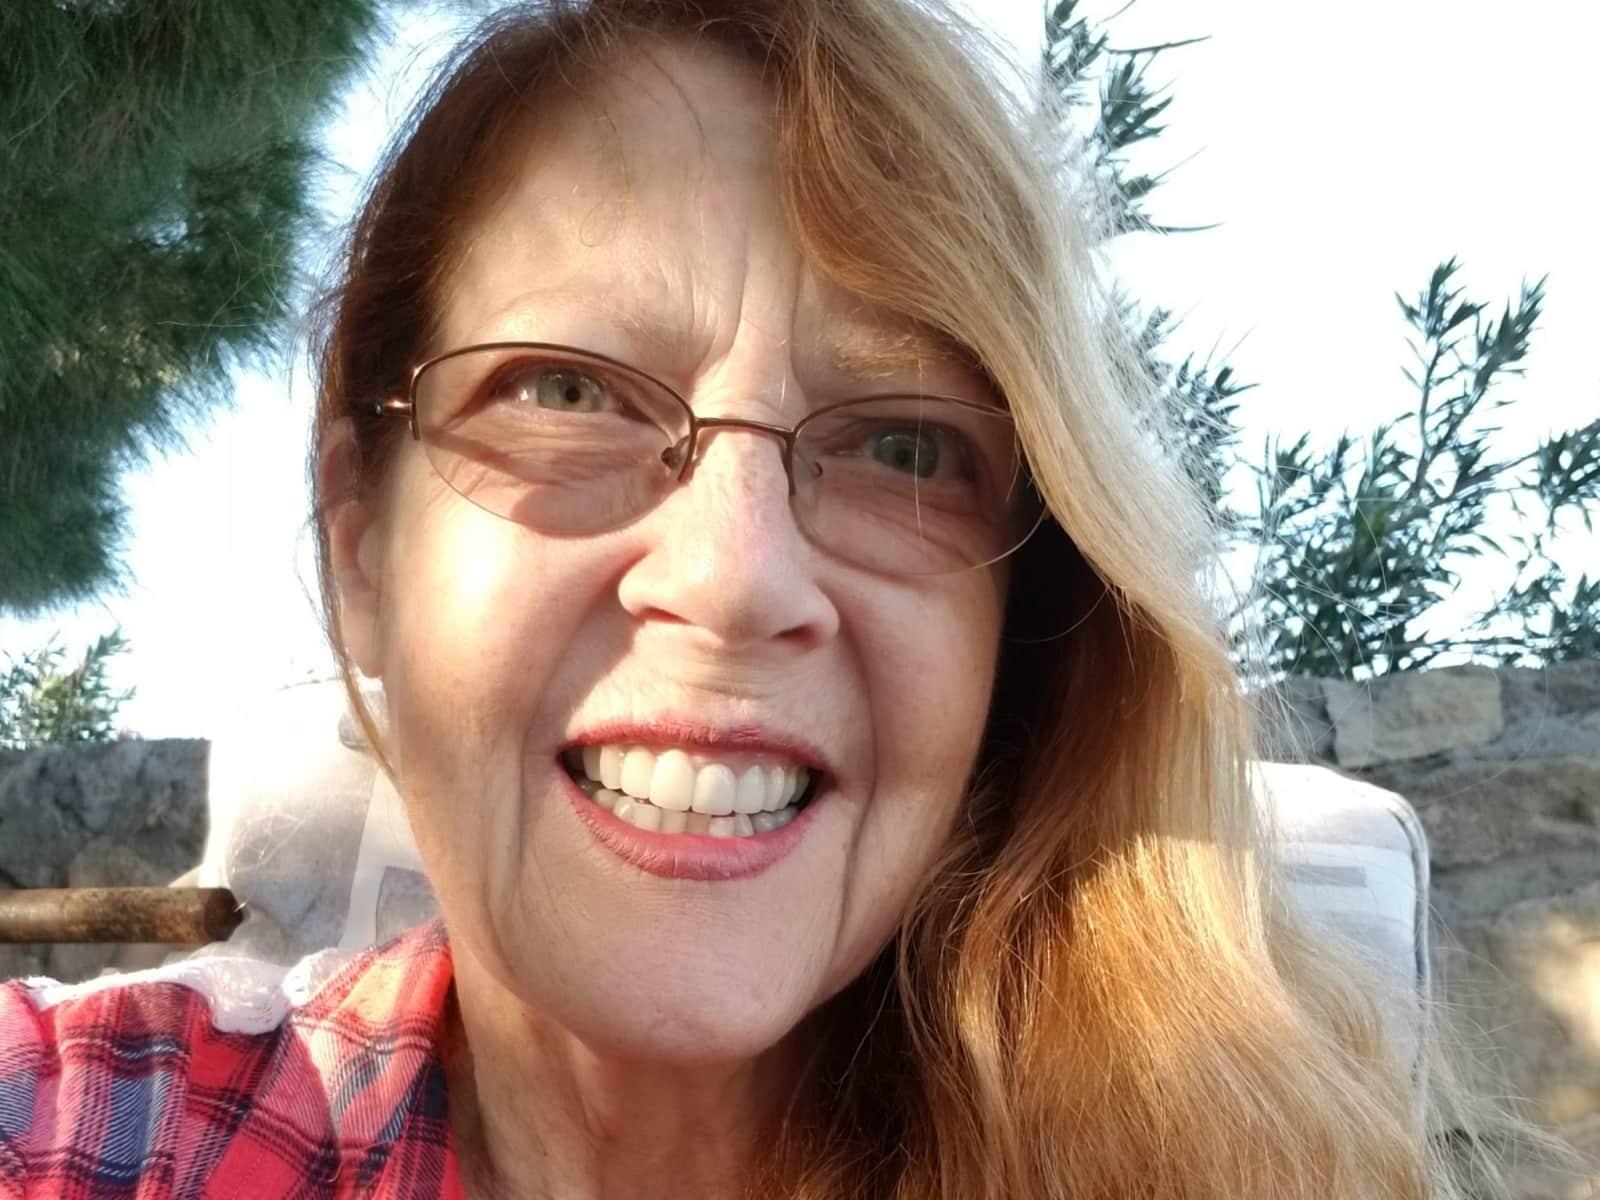 Jasmine from El Paso, Texas, United States